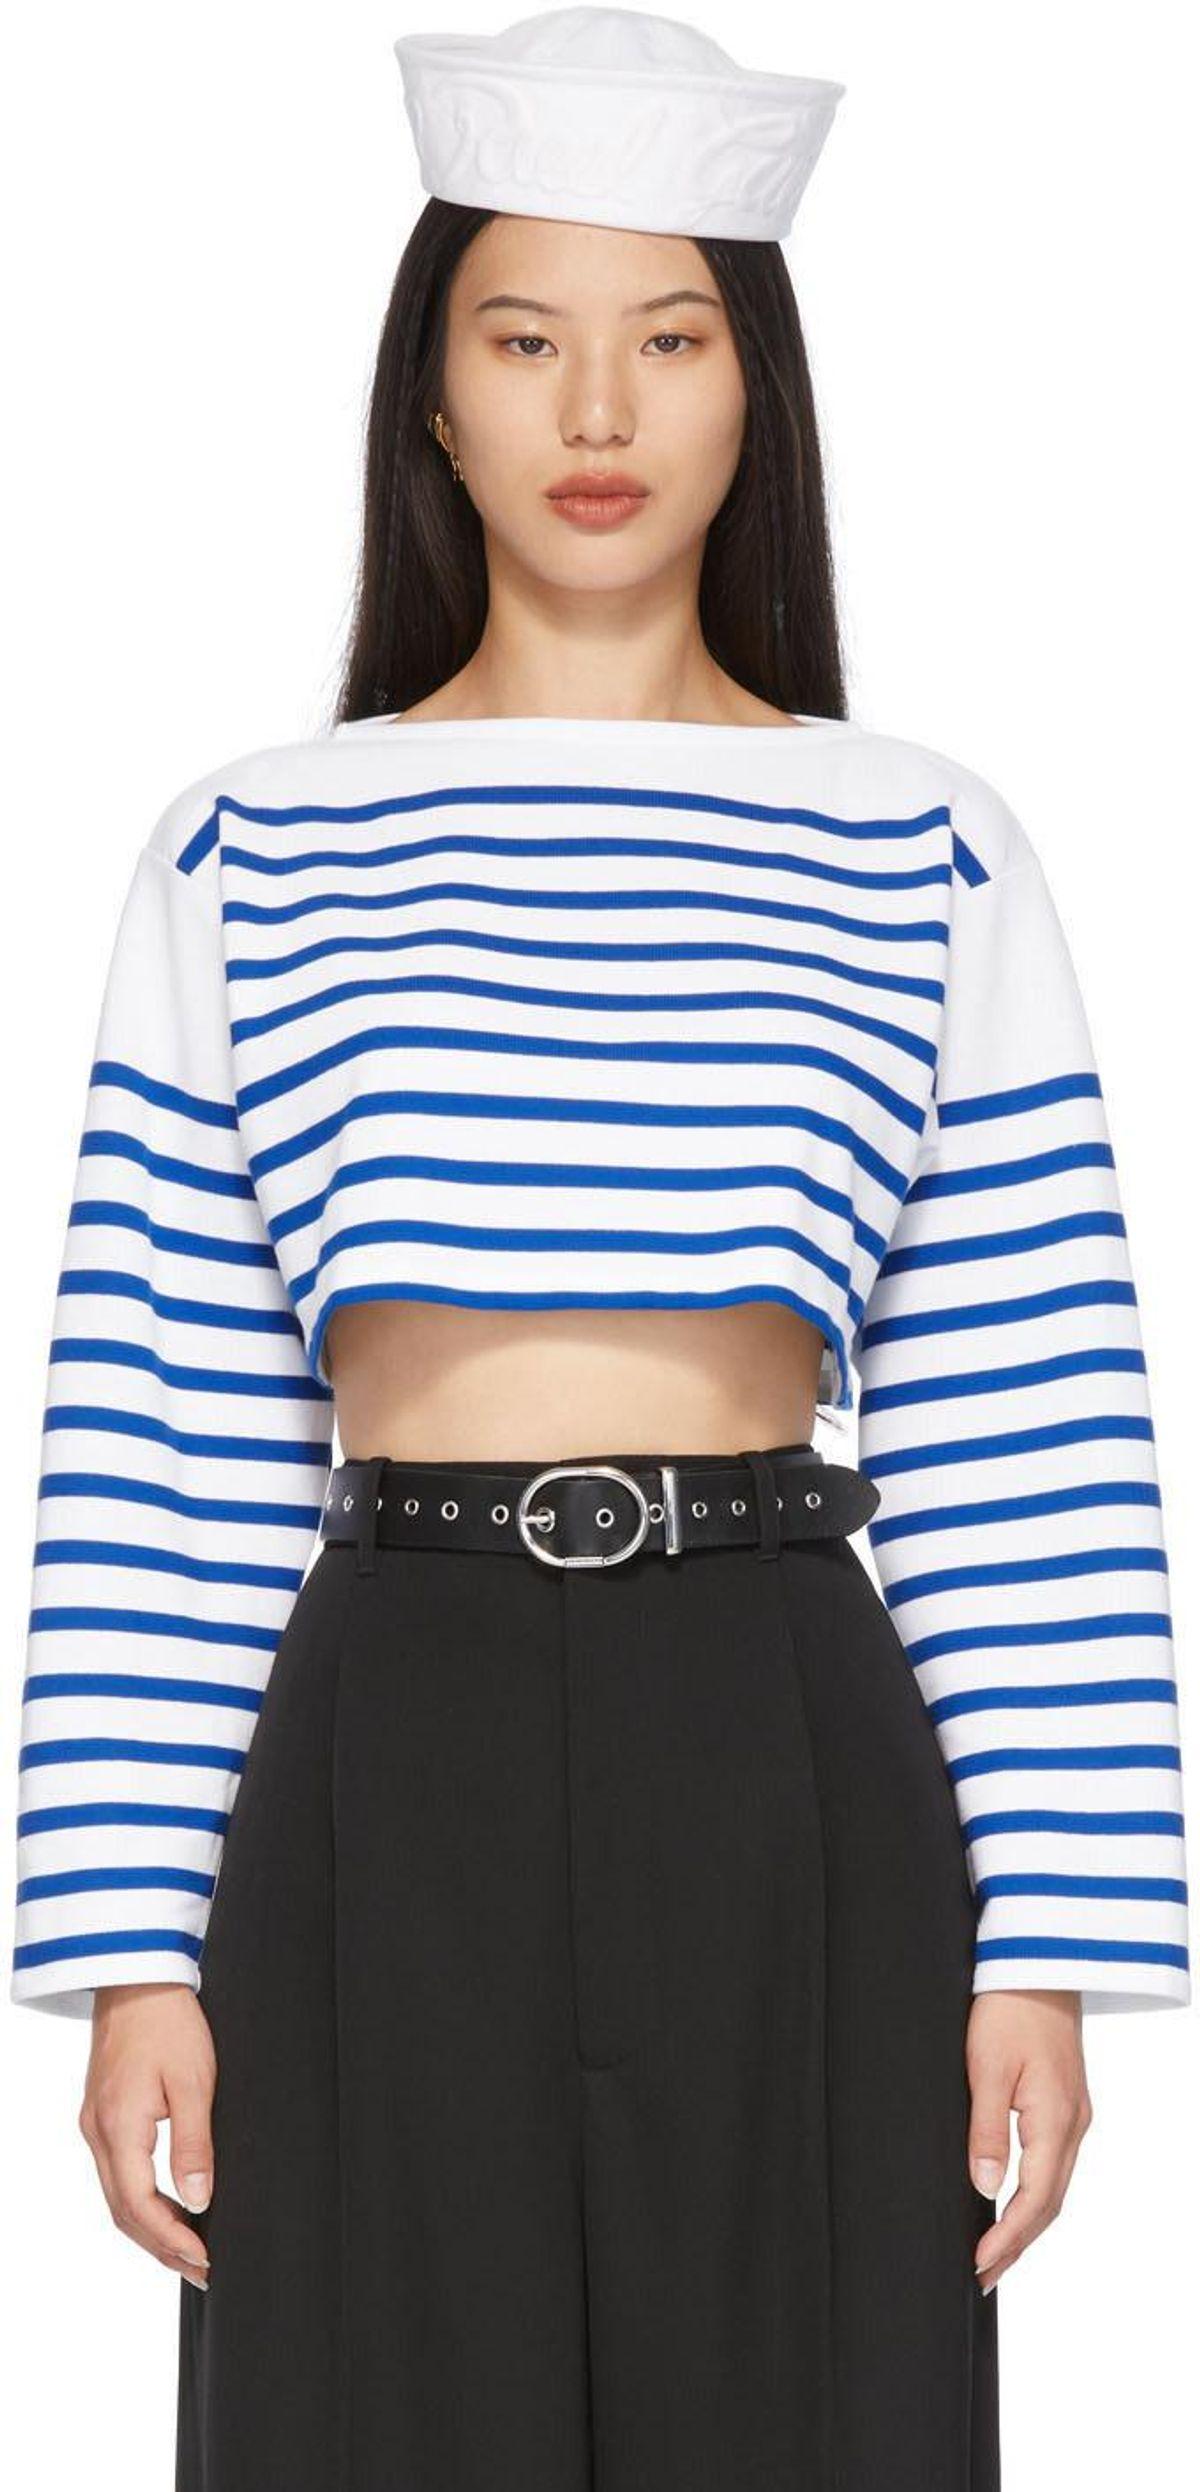 Les Marins Sailor Crop Long Sleeve T-shirt